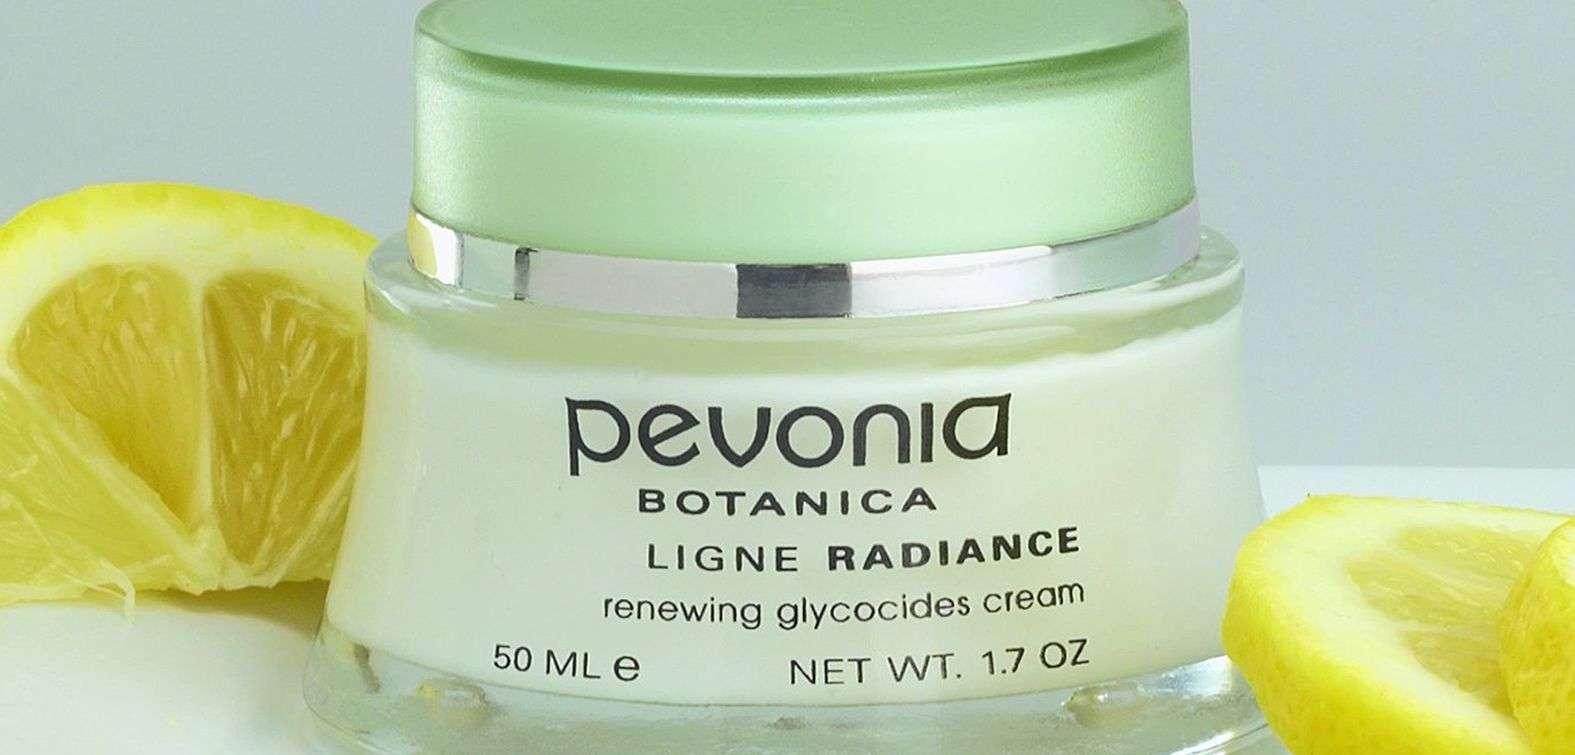 Pevonia Products at Monart